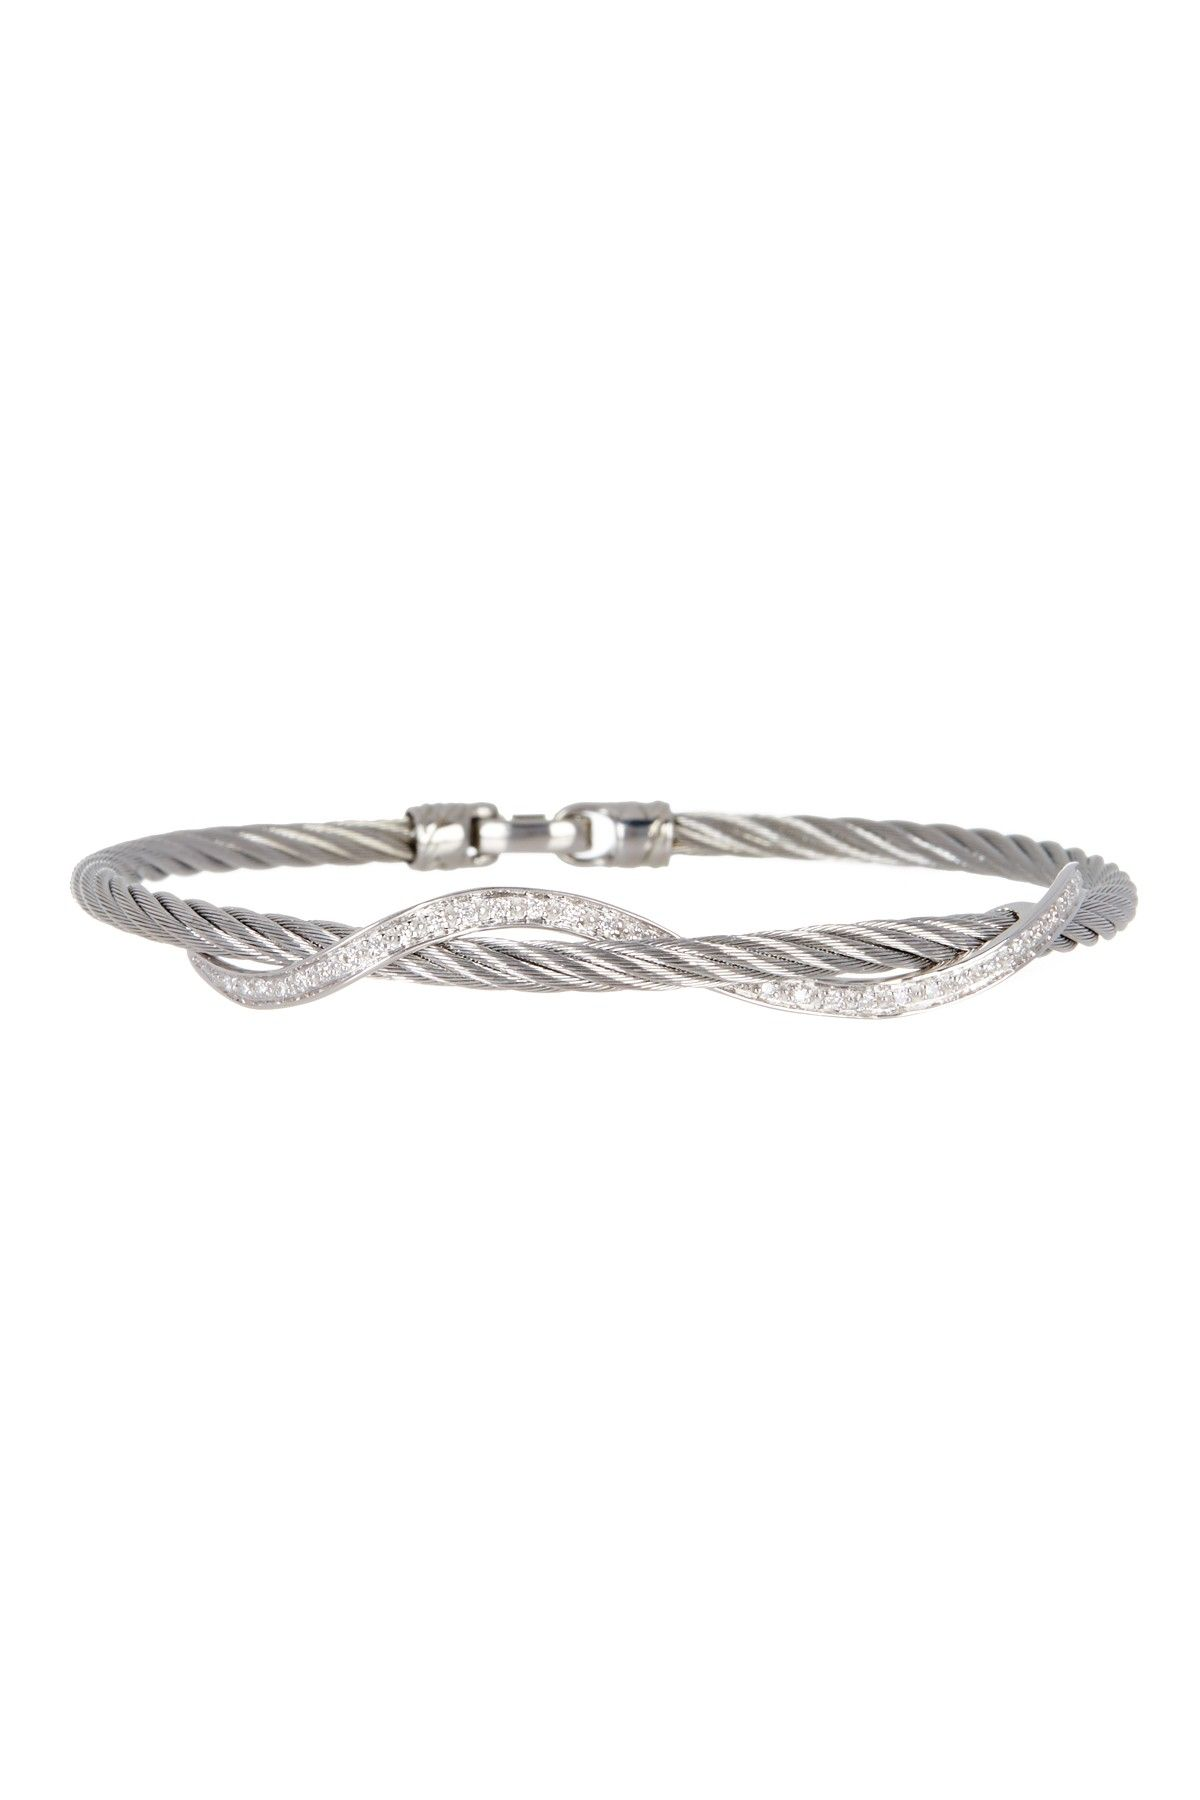 Alor k white gold u stainless steel diamond cable bracelet